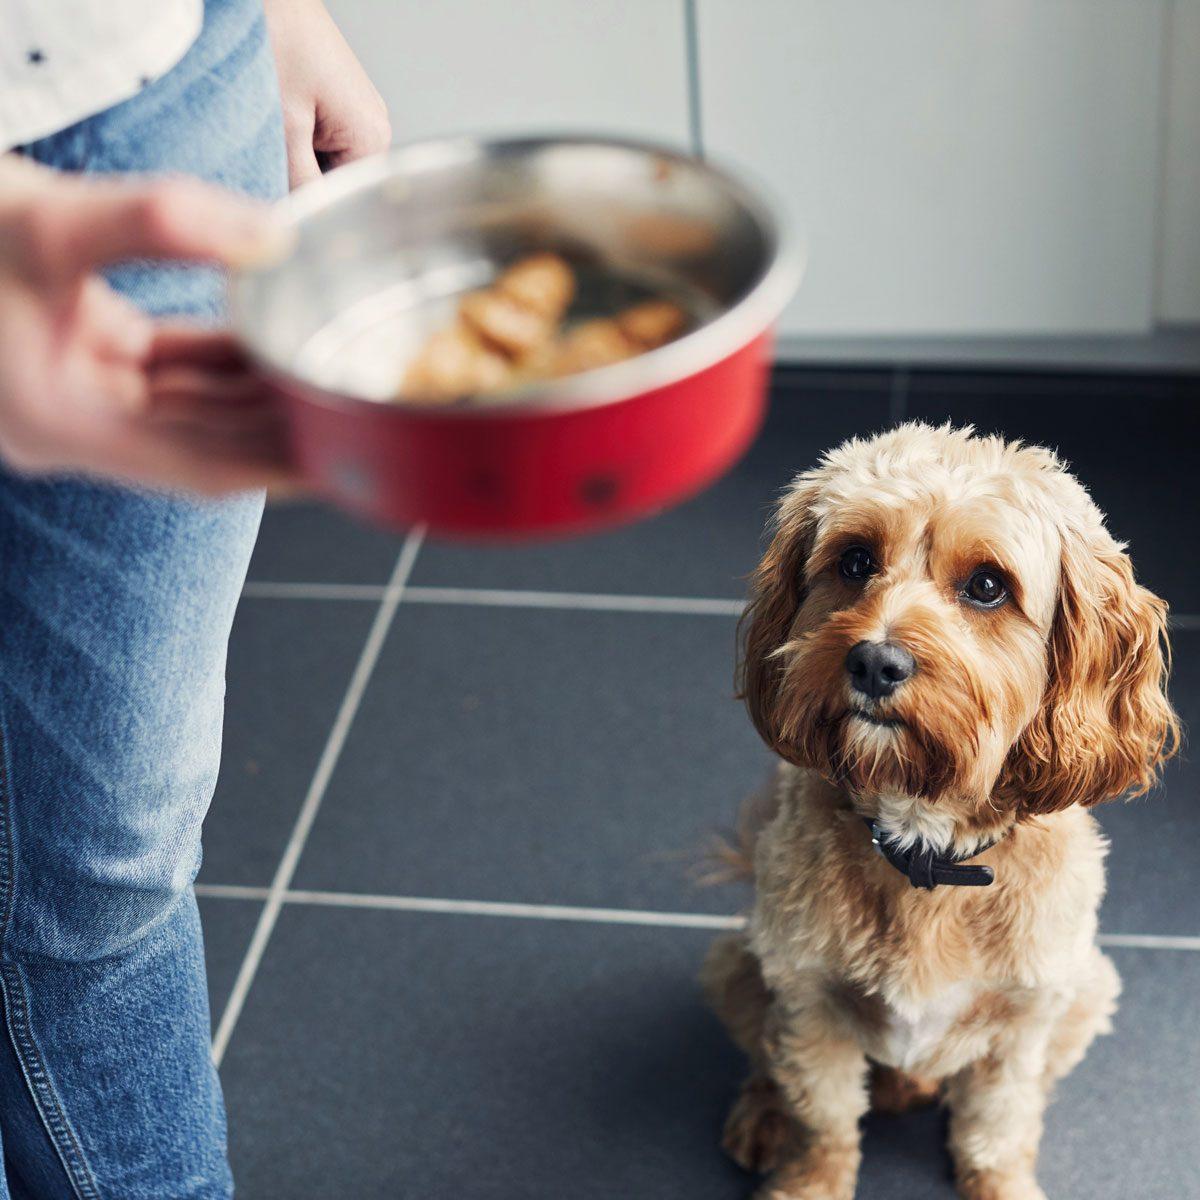 Woman feeding her pet dog